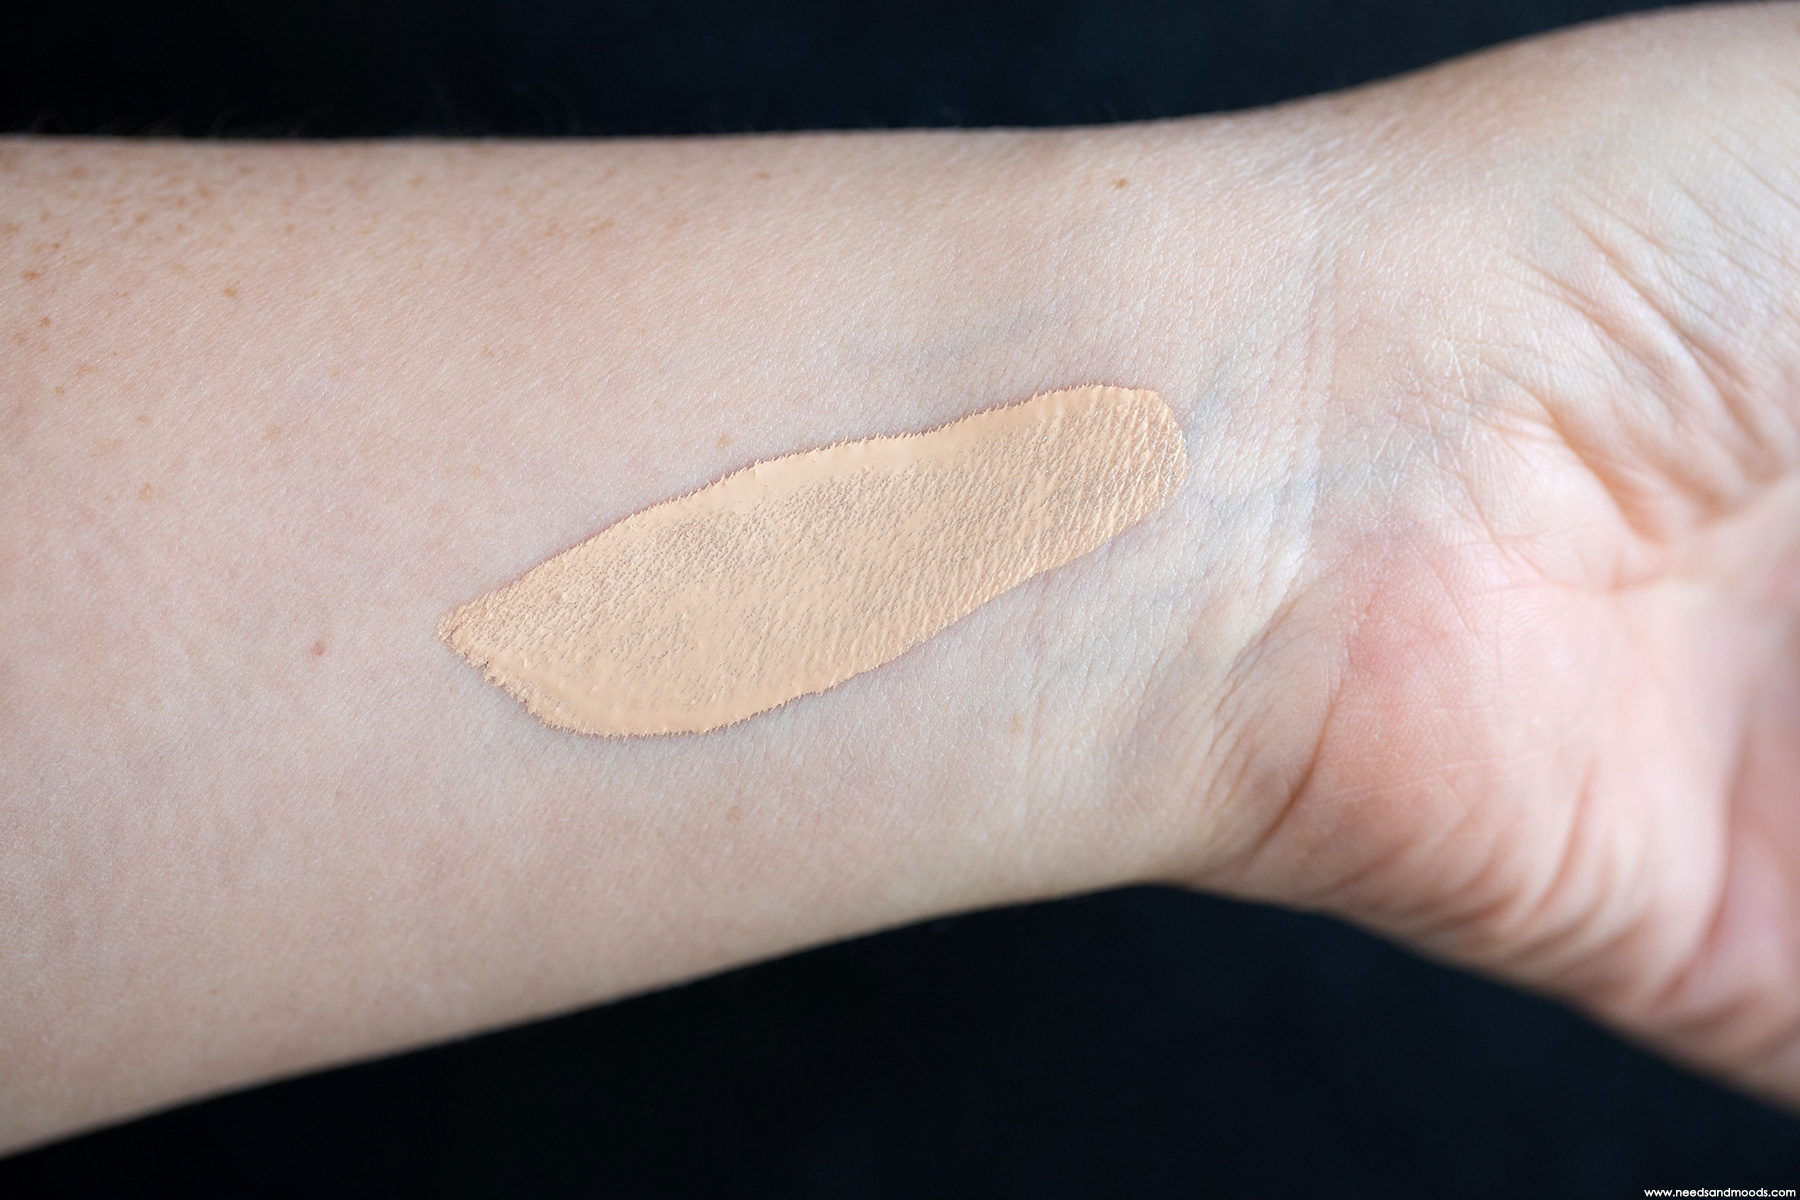 clarins-skin-illusion-swatch